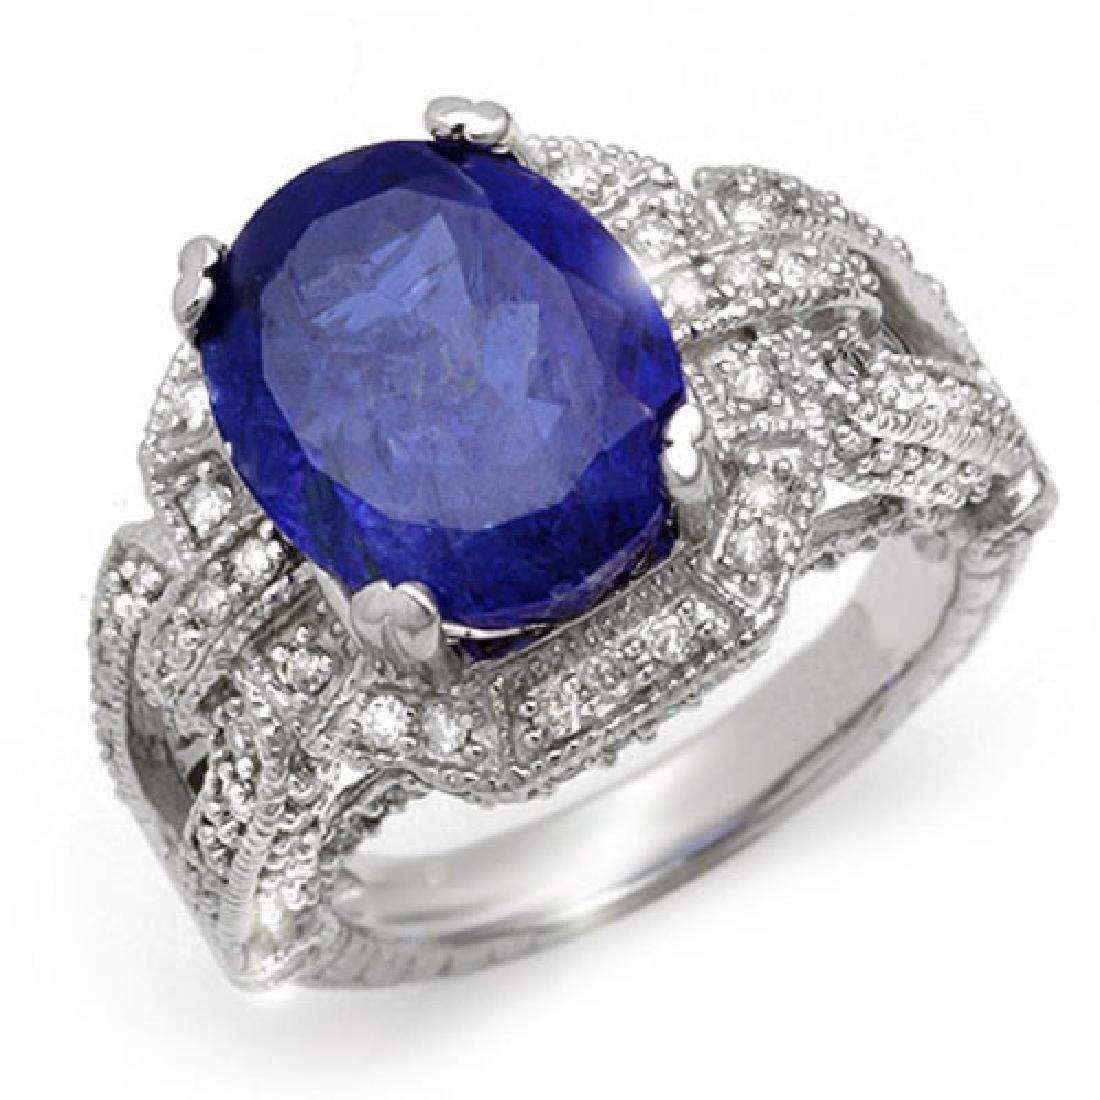 8.50 CTW Tanzanite & Diamond Ring 18K White Gold